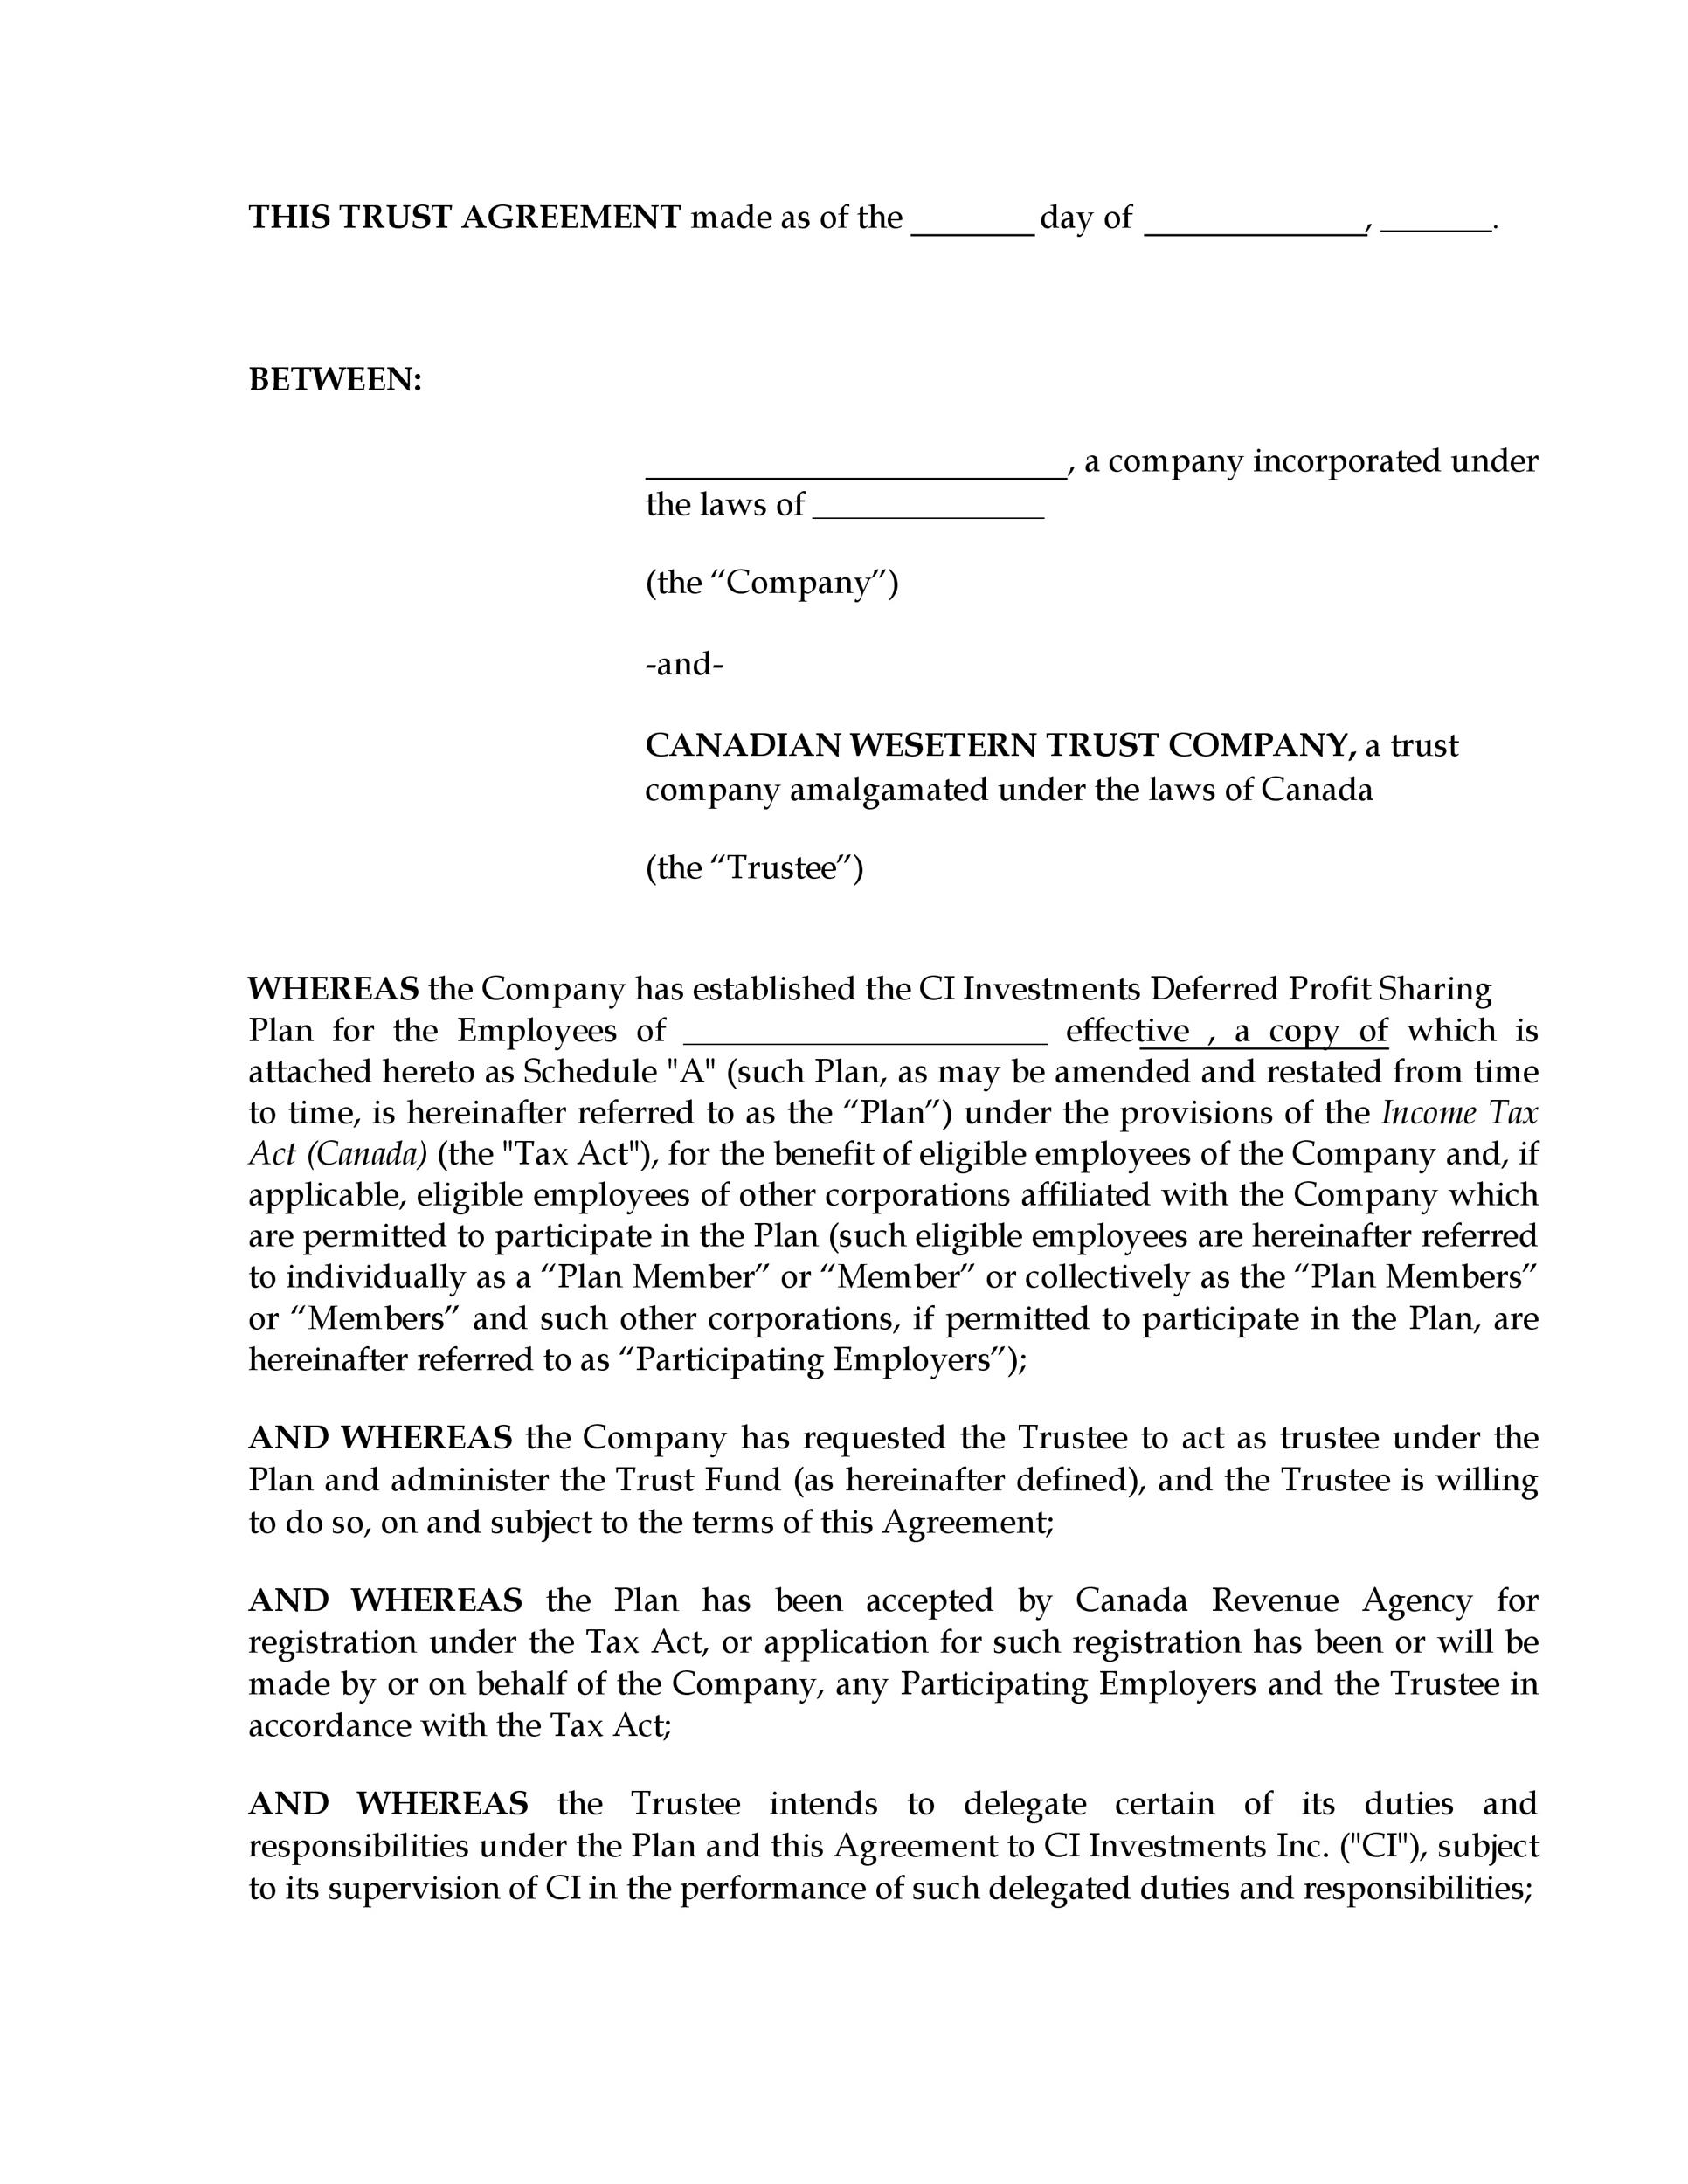 Free trust agreement 24